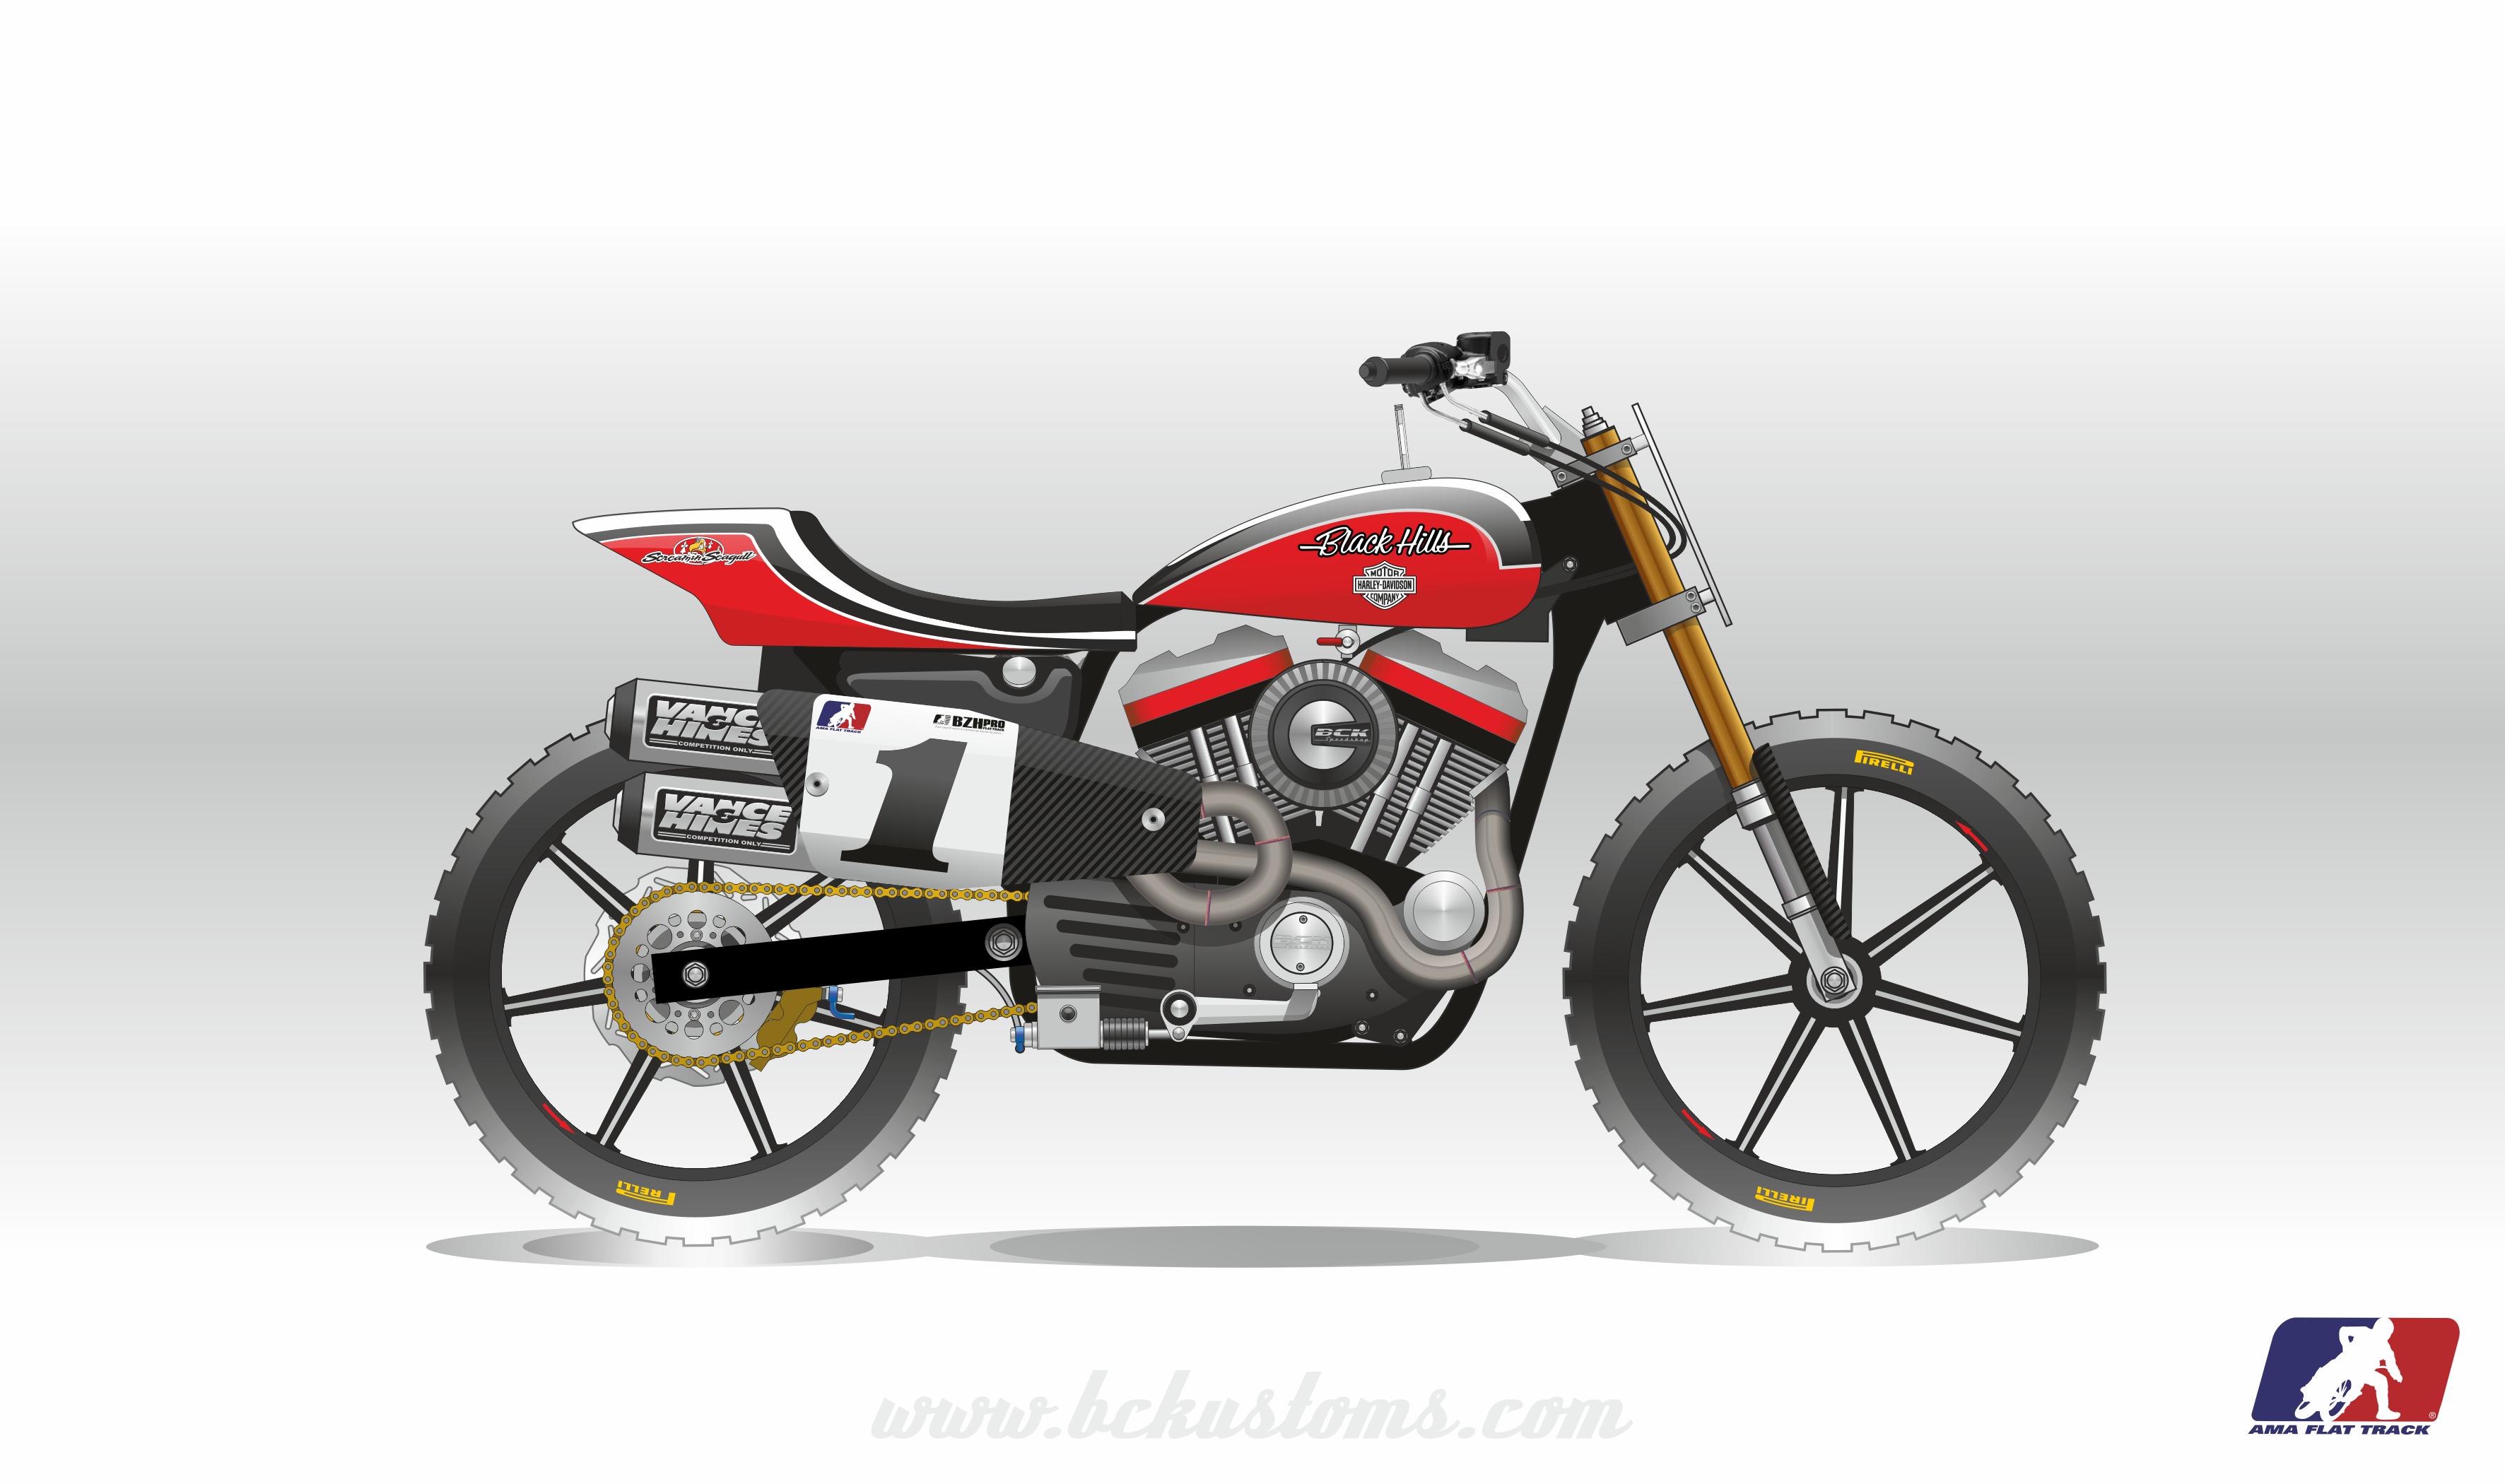 2015-bck-racing-flat-track-sportster-mees-01102016